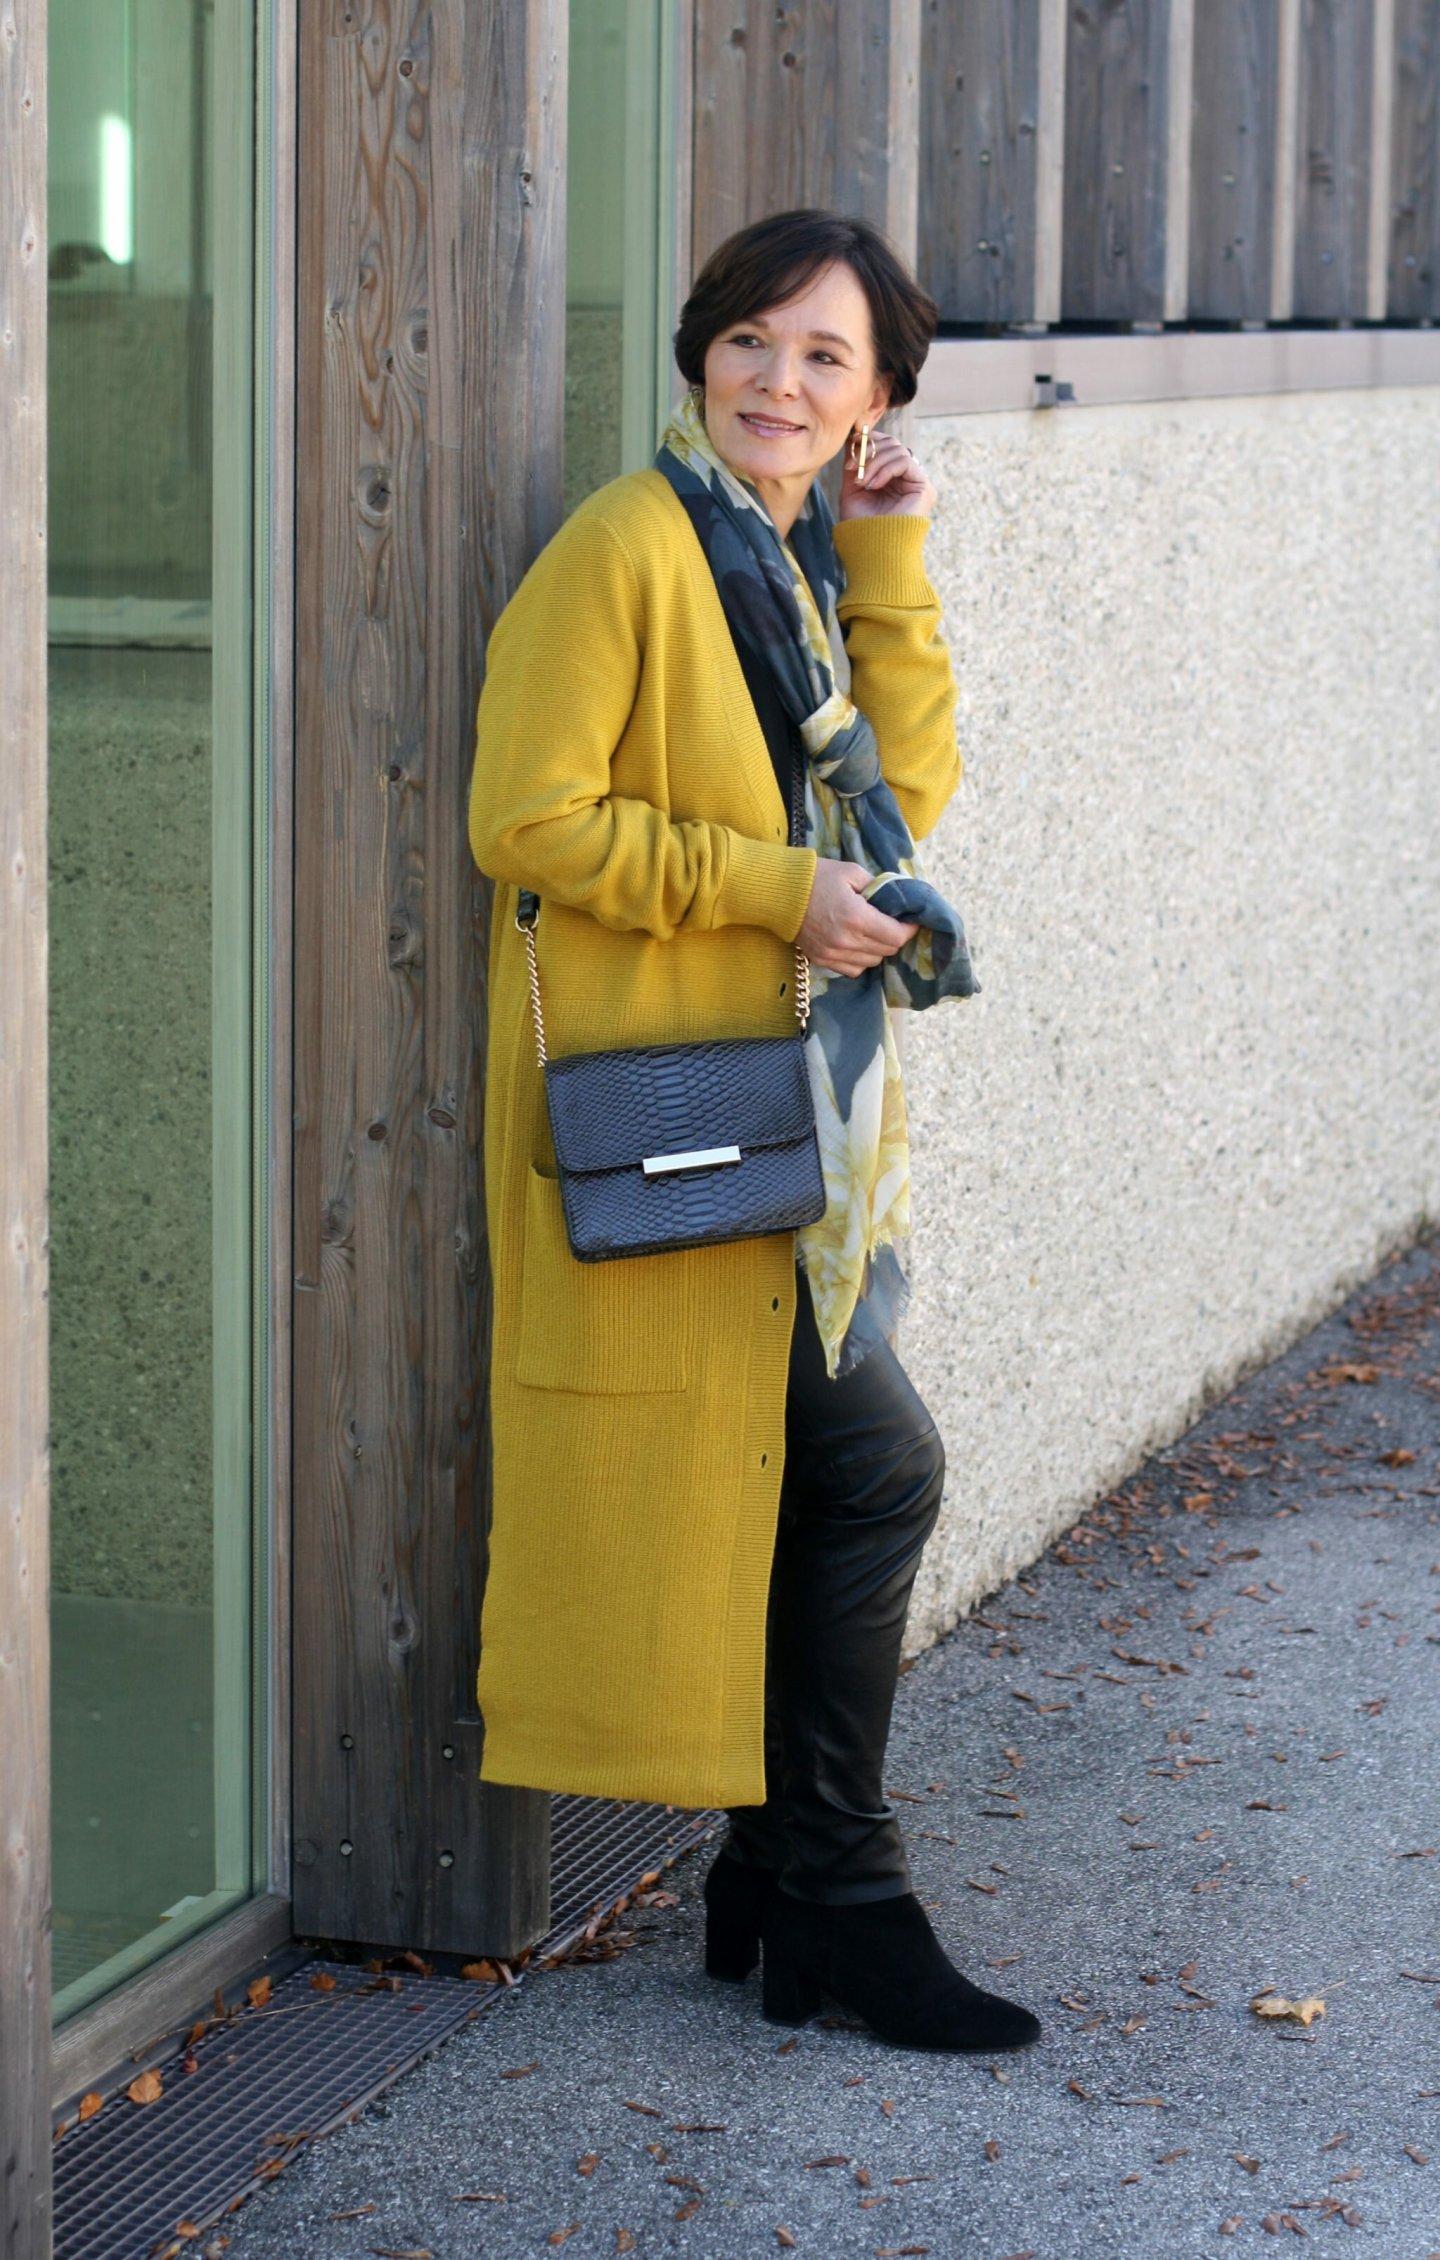 Trend Herbstfarbe Gelb Cardigan Strickmantel Esprit Lederleggings 50plus Blogger LadyofStyle